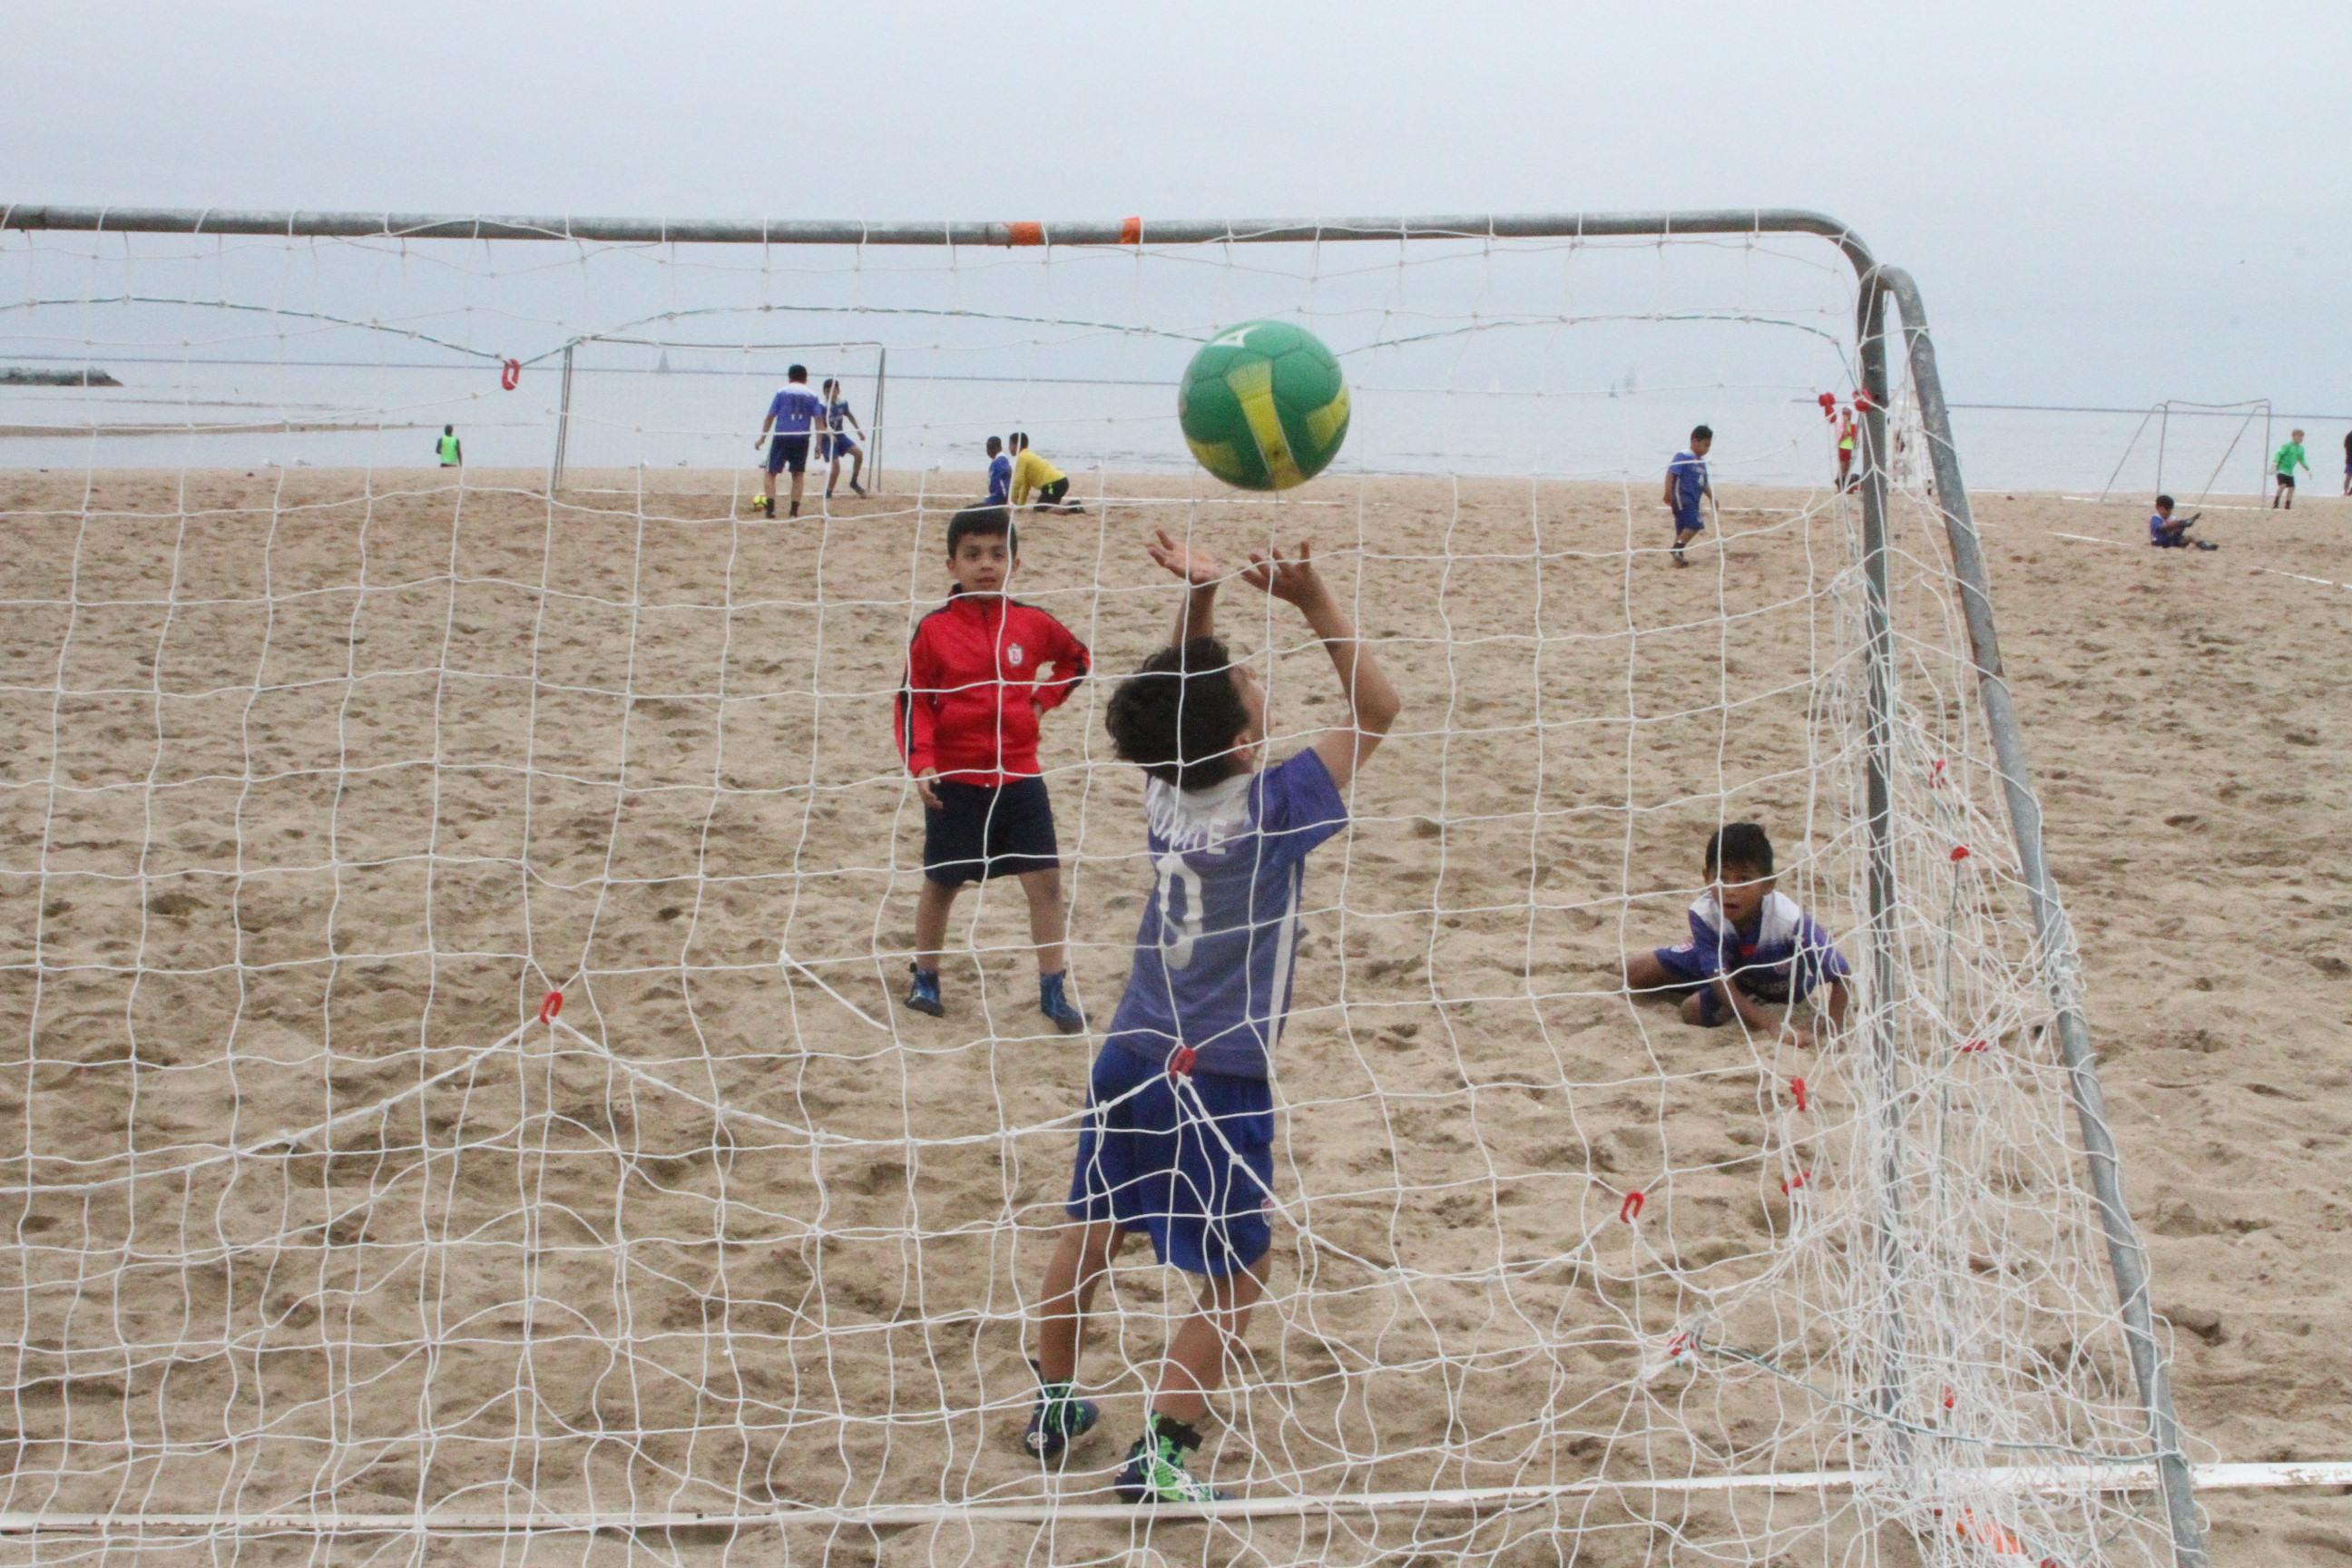 Sea Bluff soccer tourney